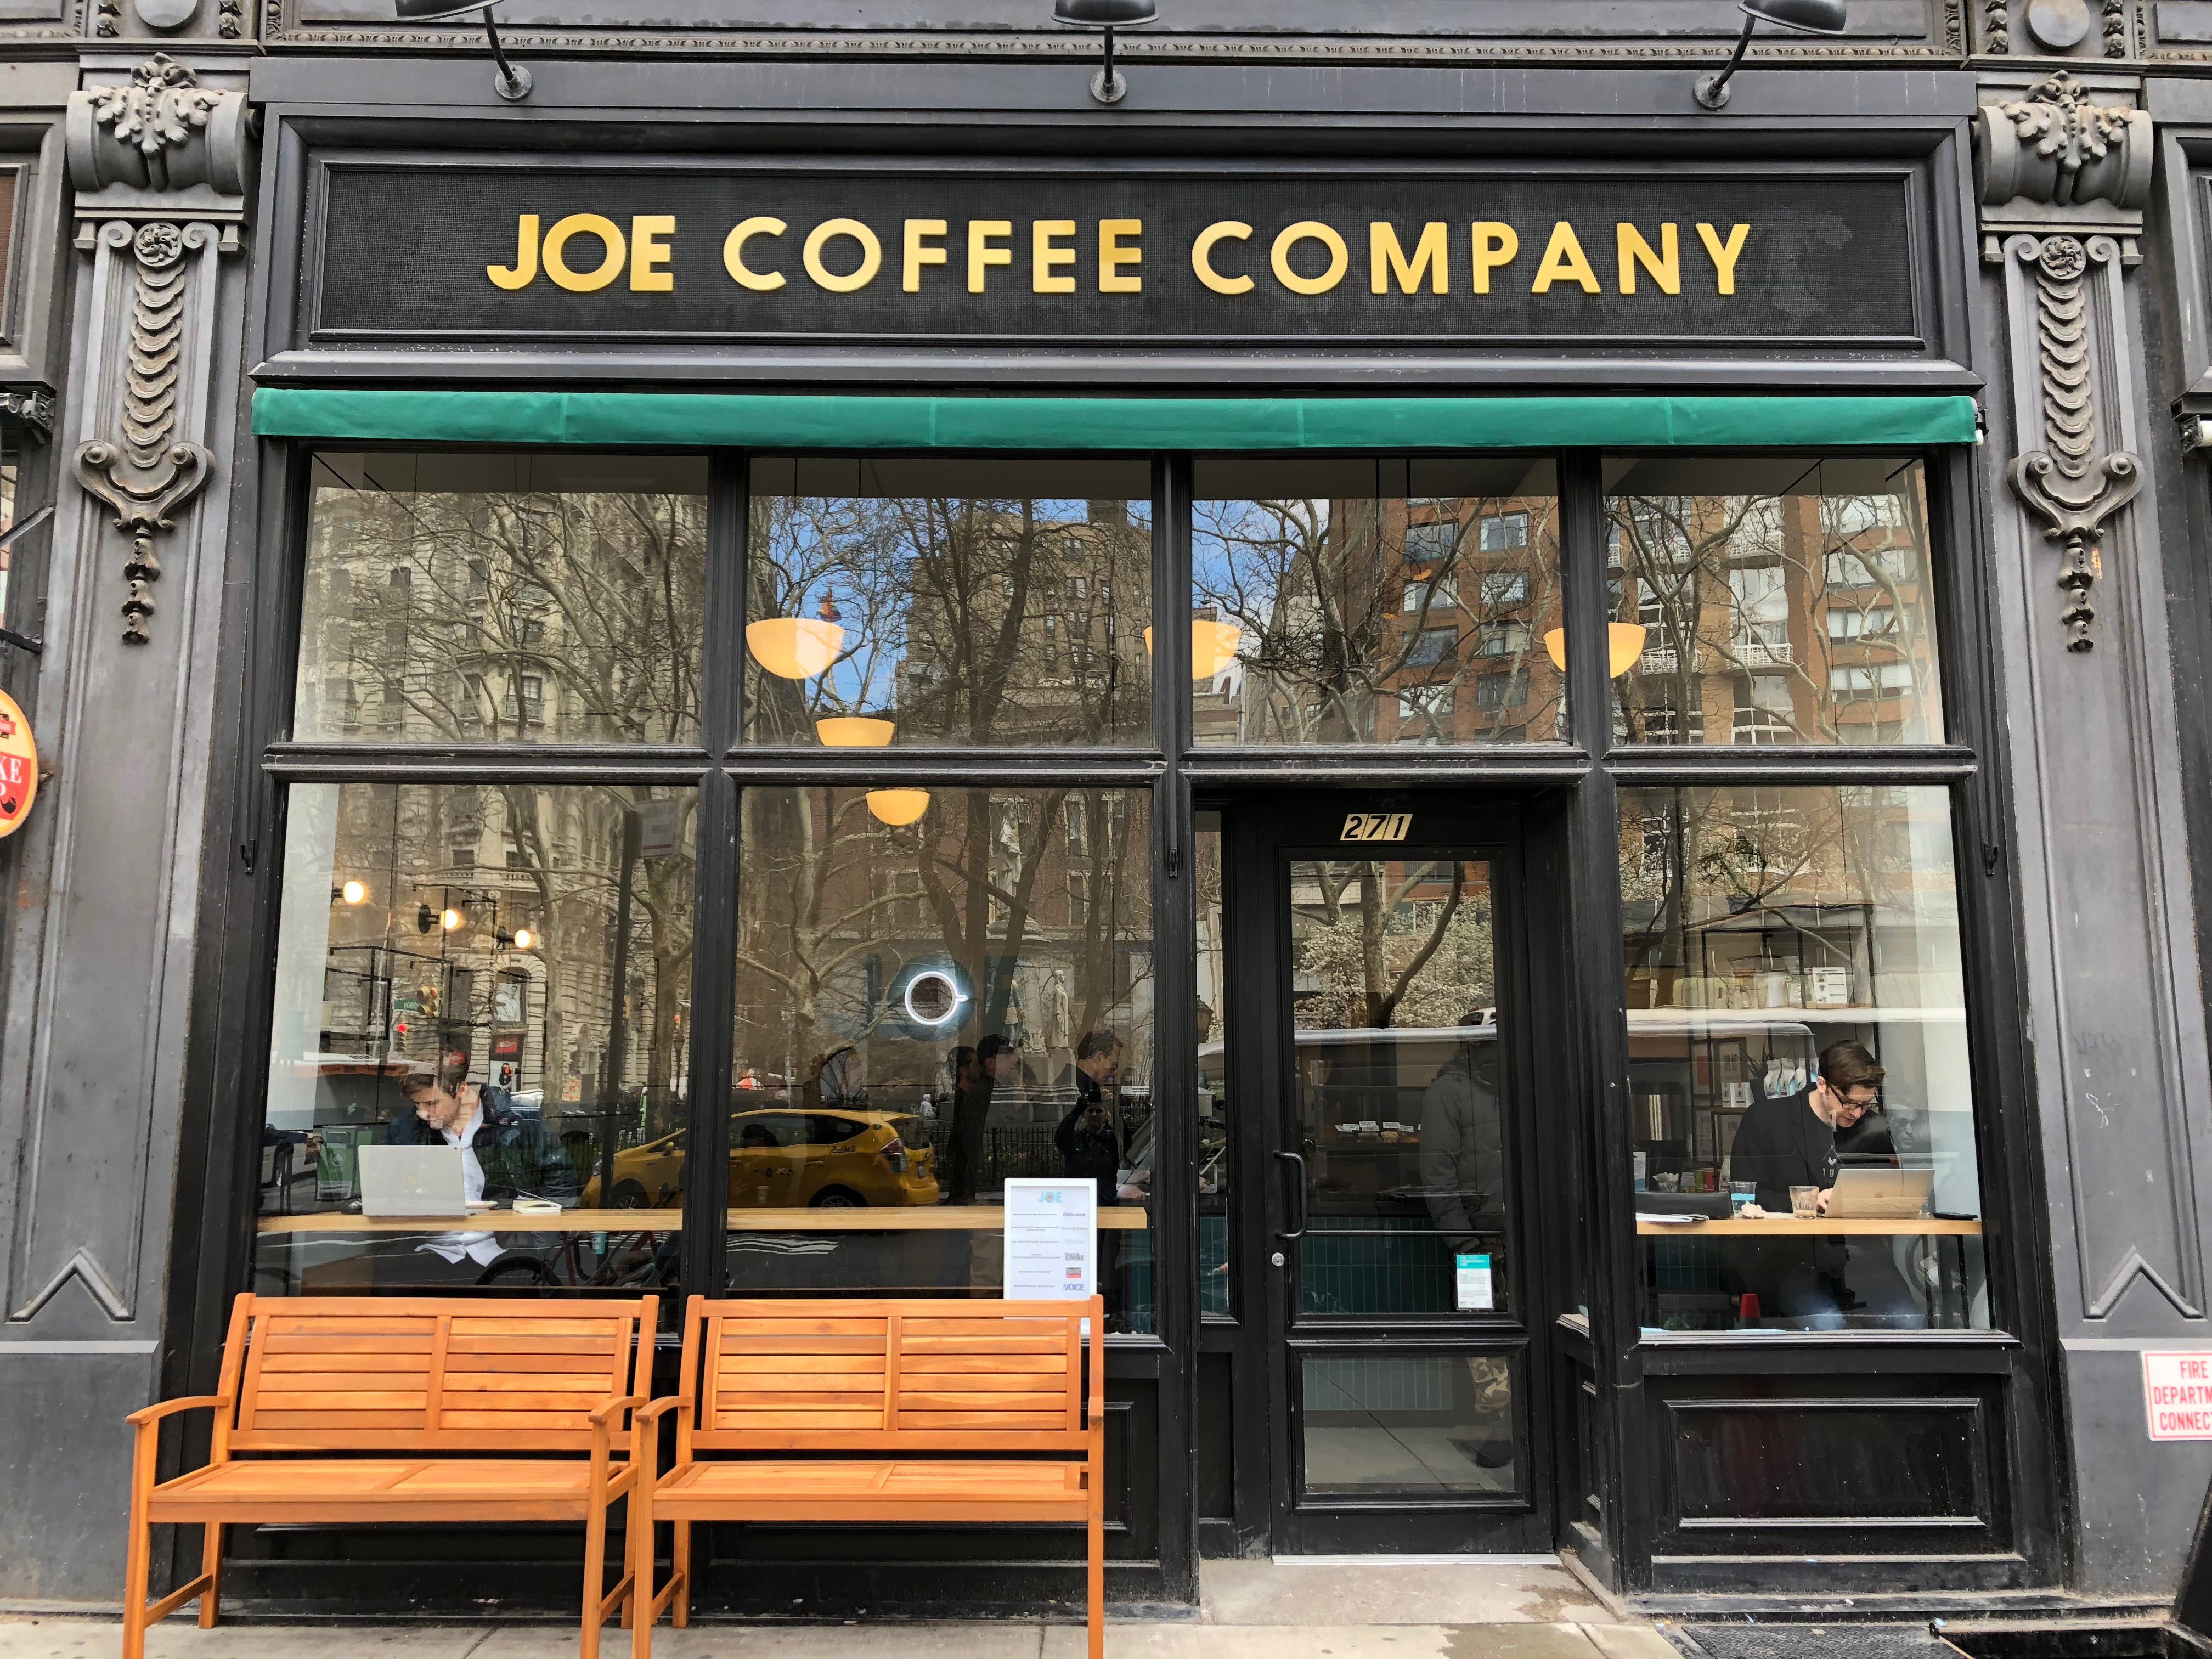 W 73rd & Amsterdam – Joe Coffee Company